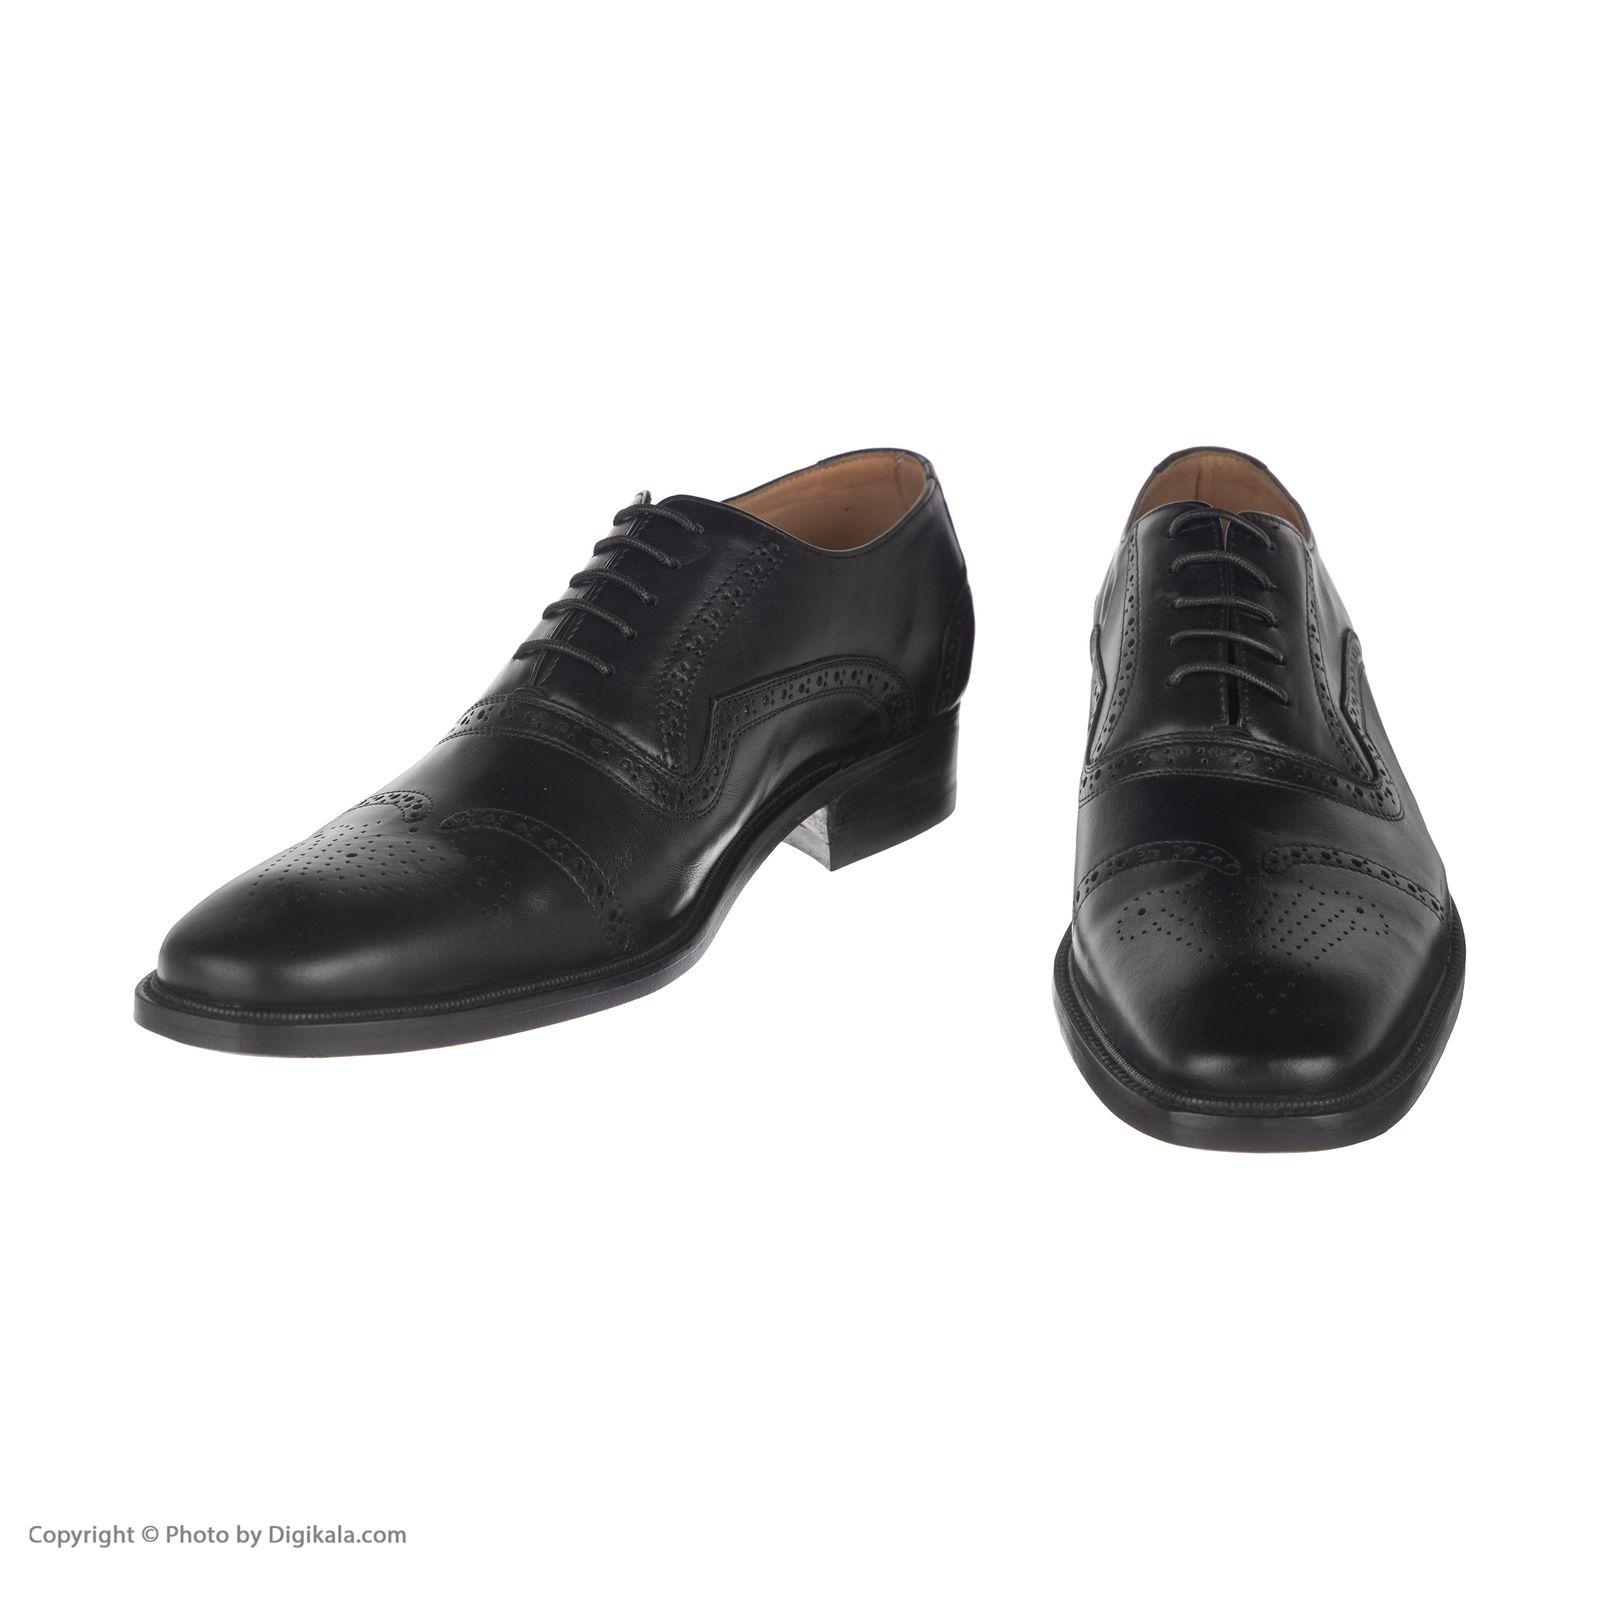 کفش مردانه نظری کد 433 -  - 4